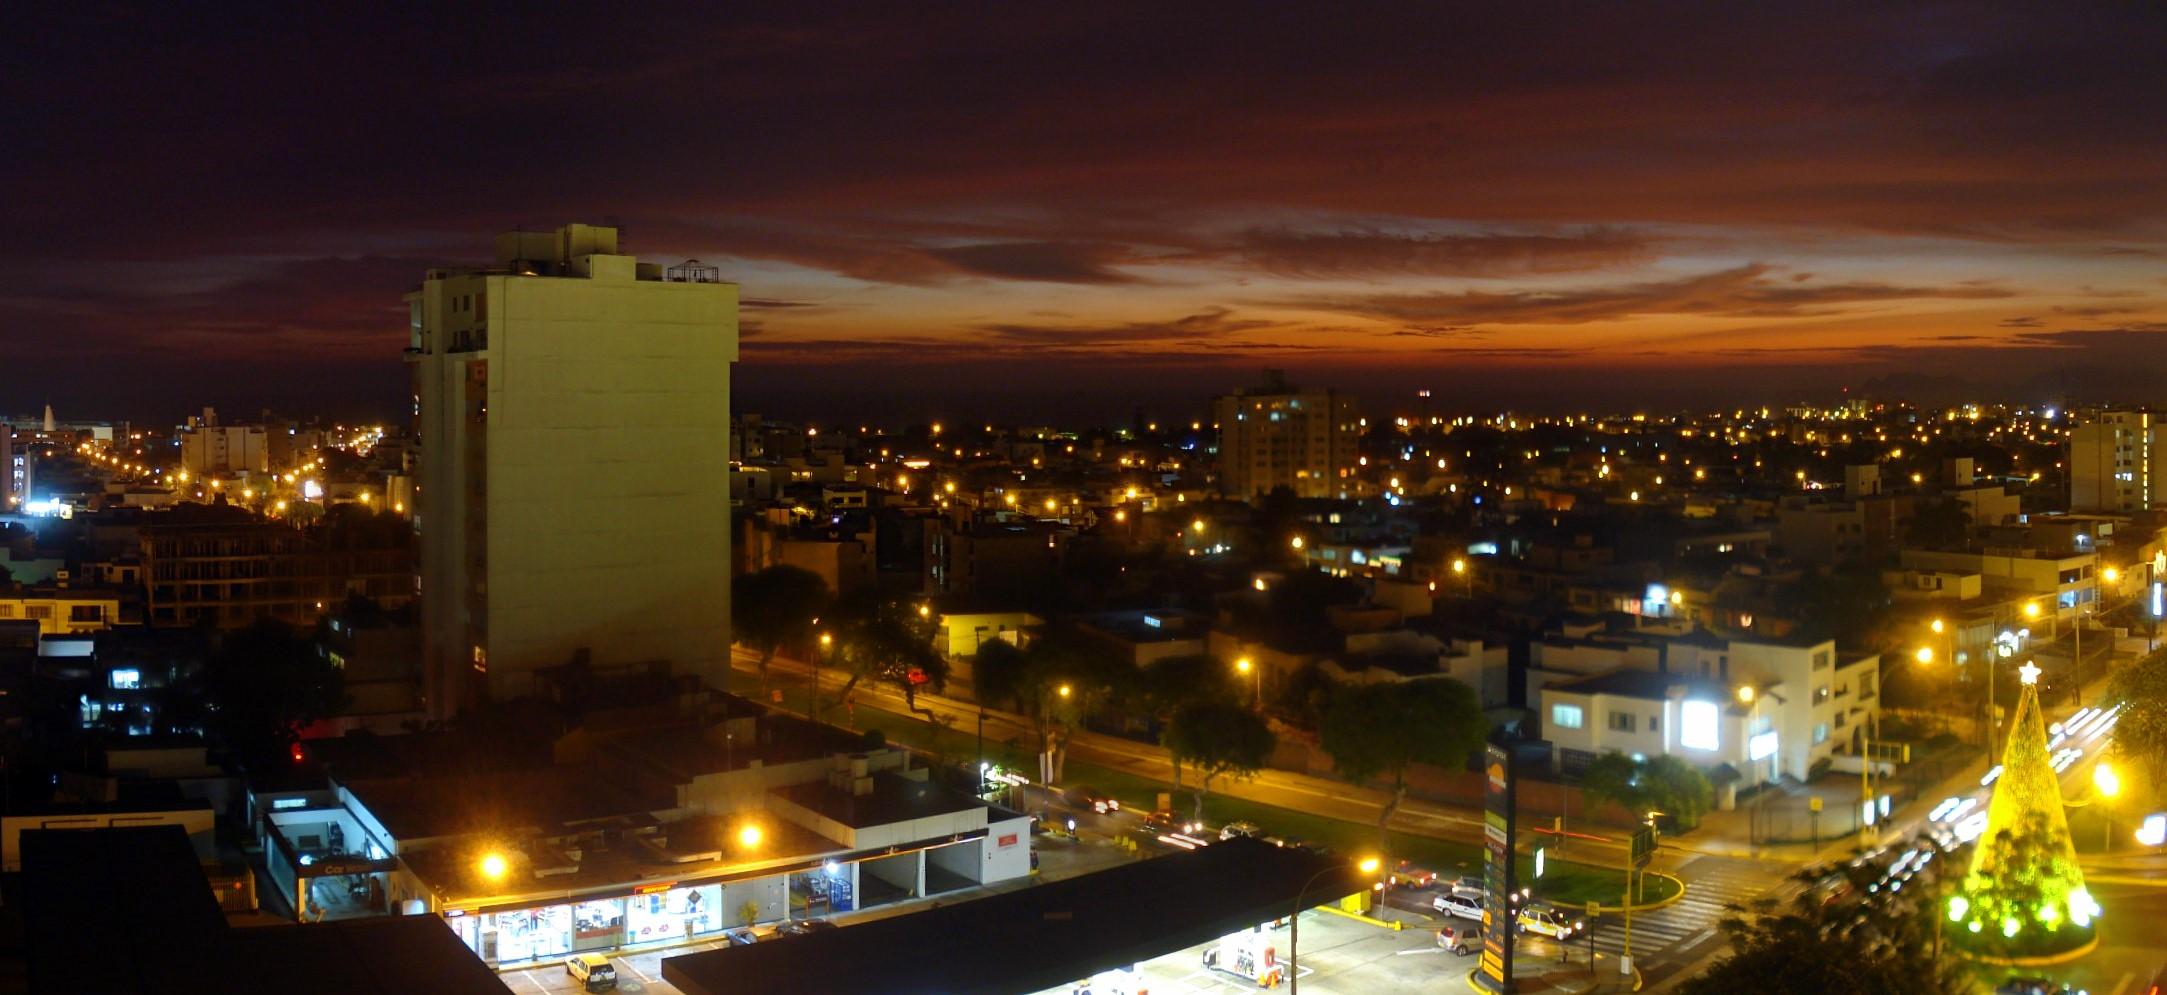 Lima, photo by Miguel A Vera Leon